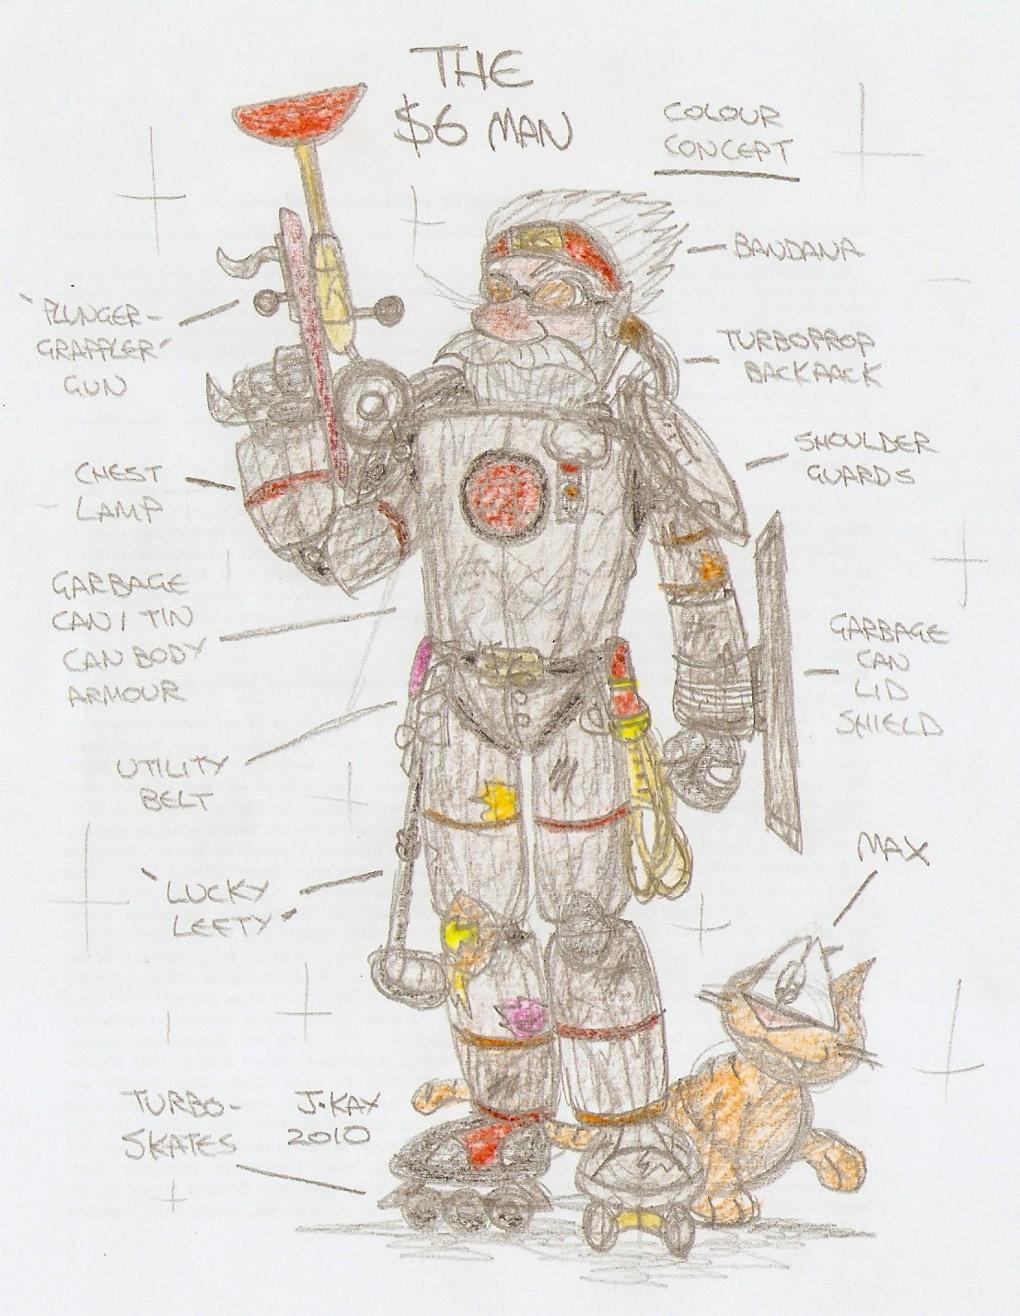 Concept art: The $6 Man 4